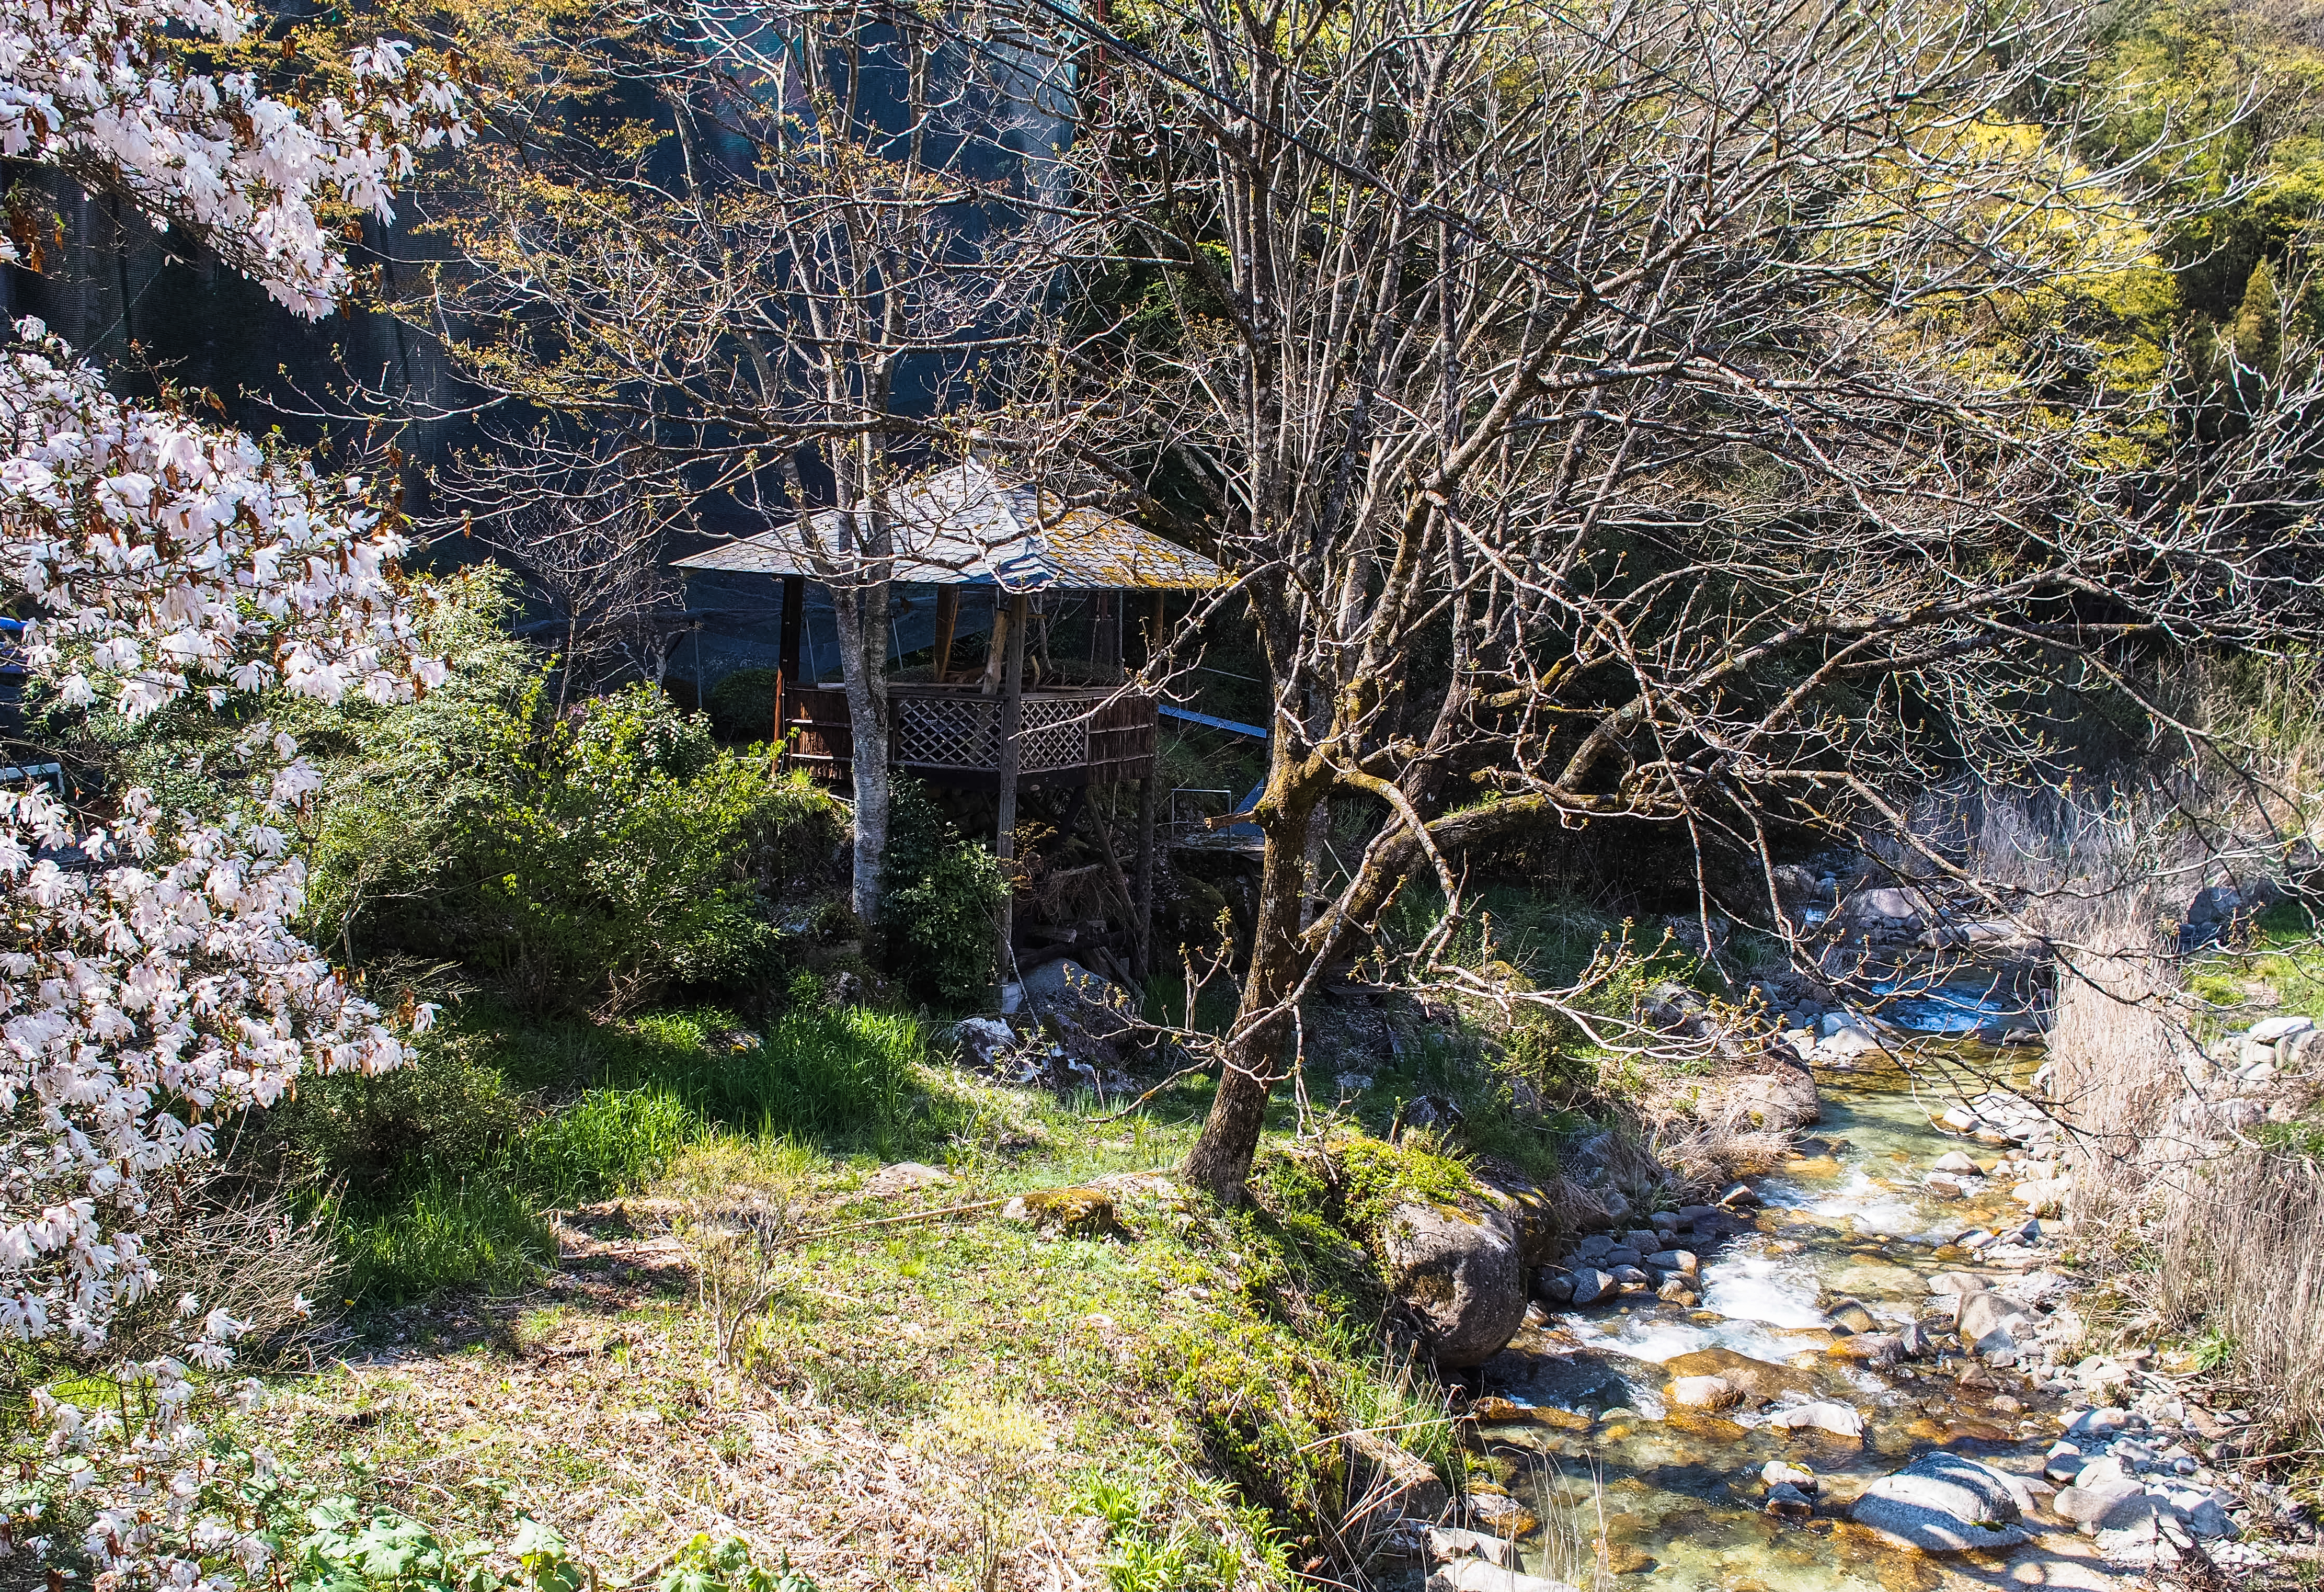 a hut at a creek